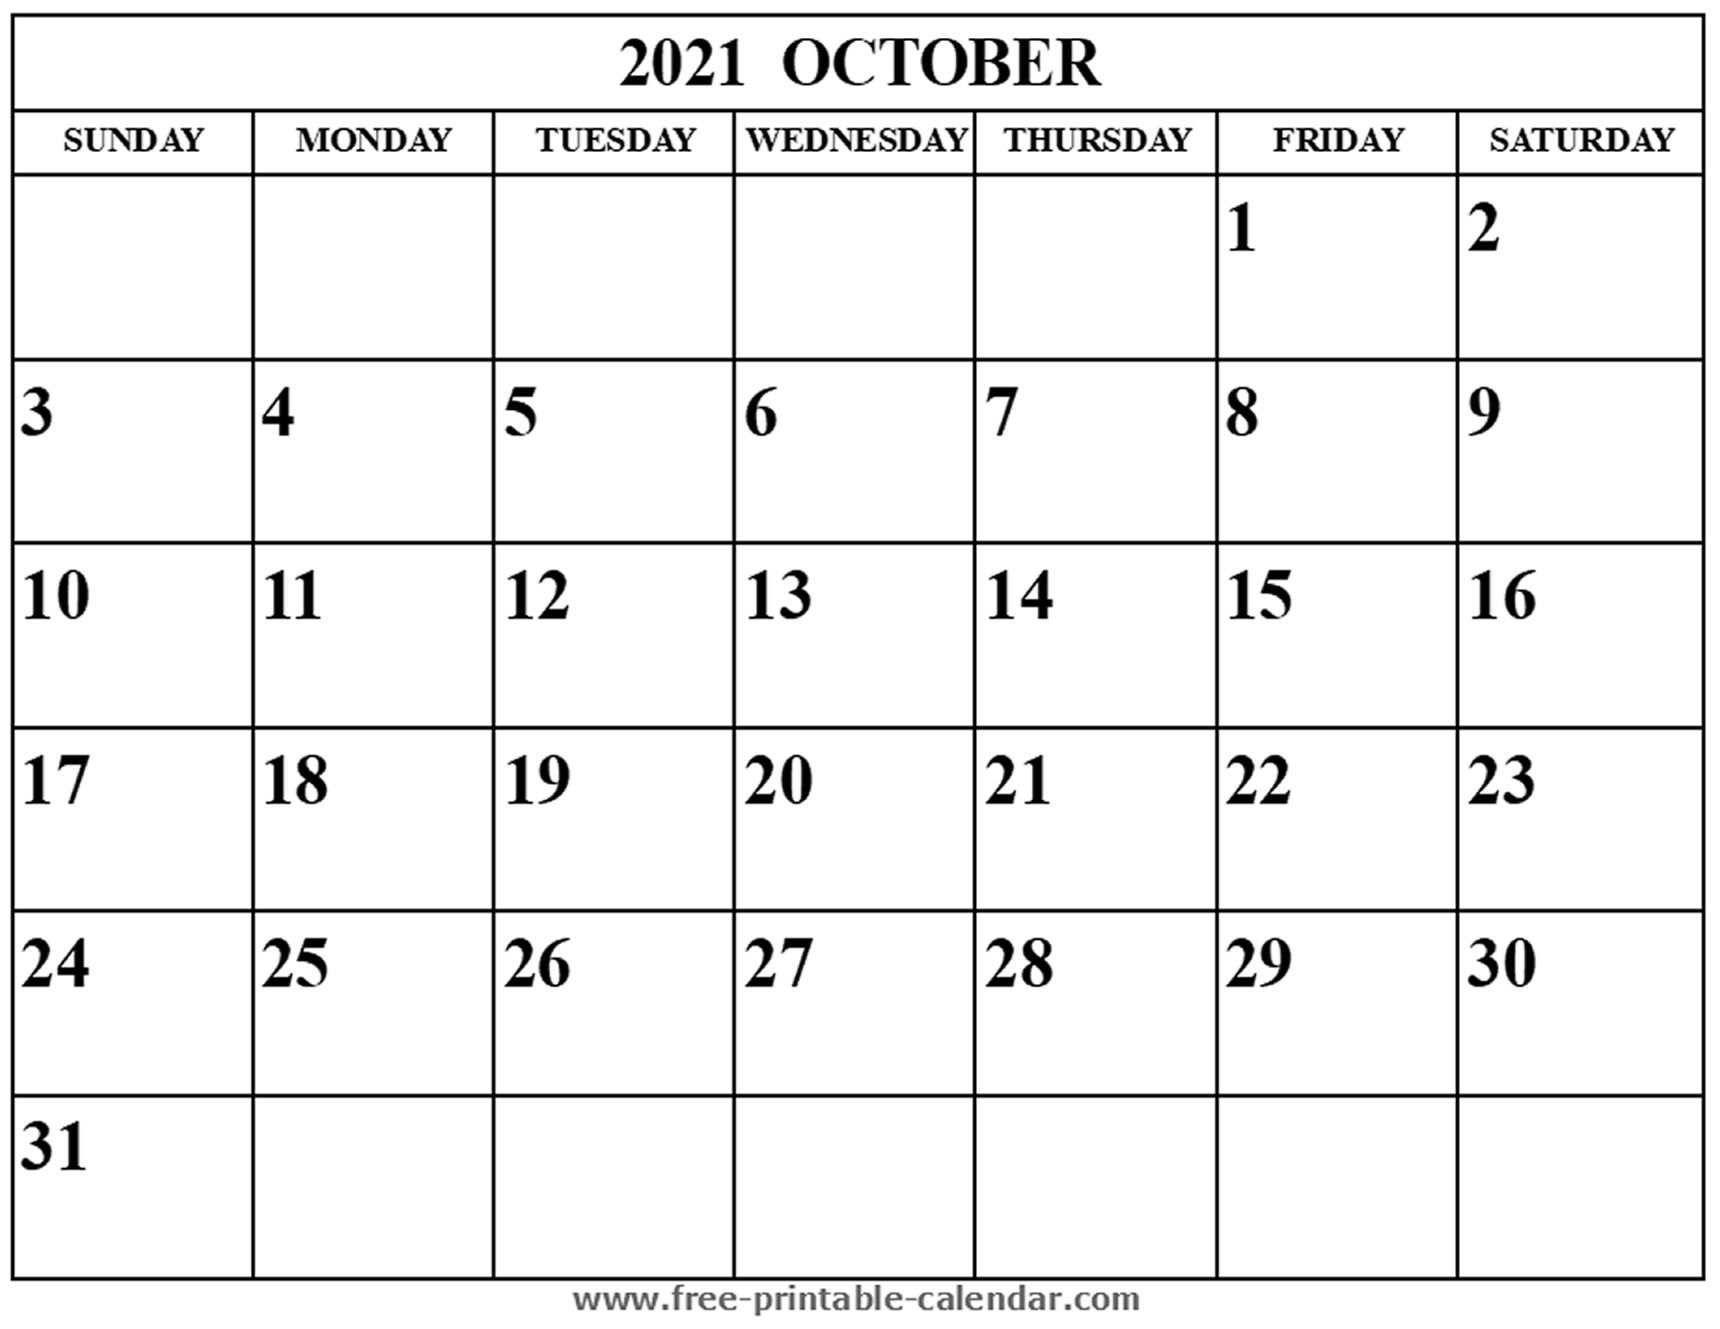 blank october 2021 calendar free printable calendar